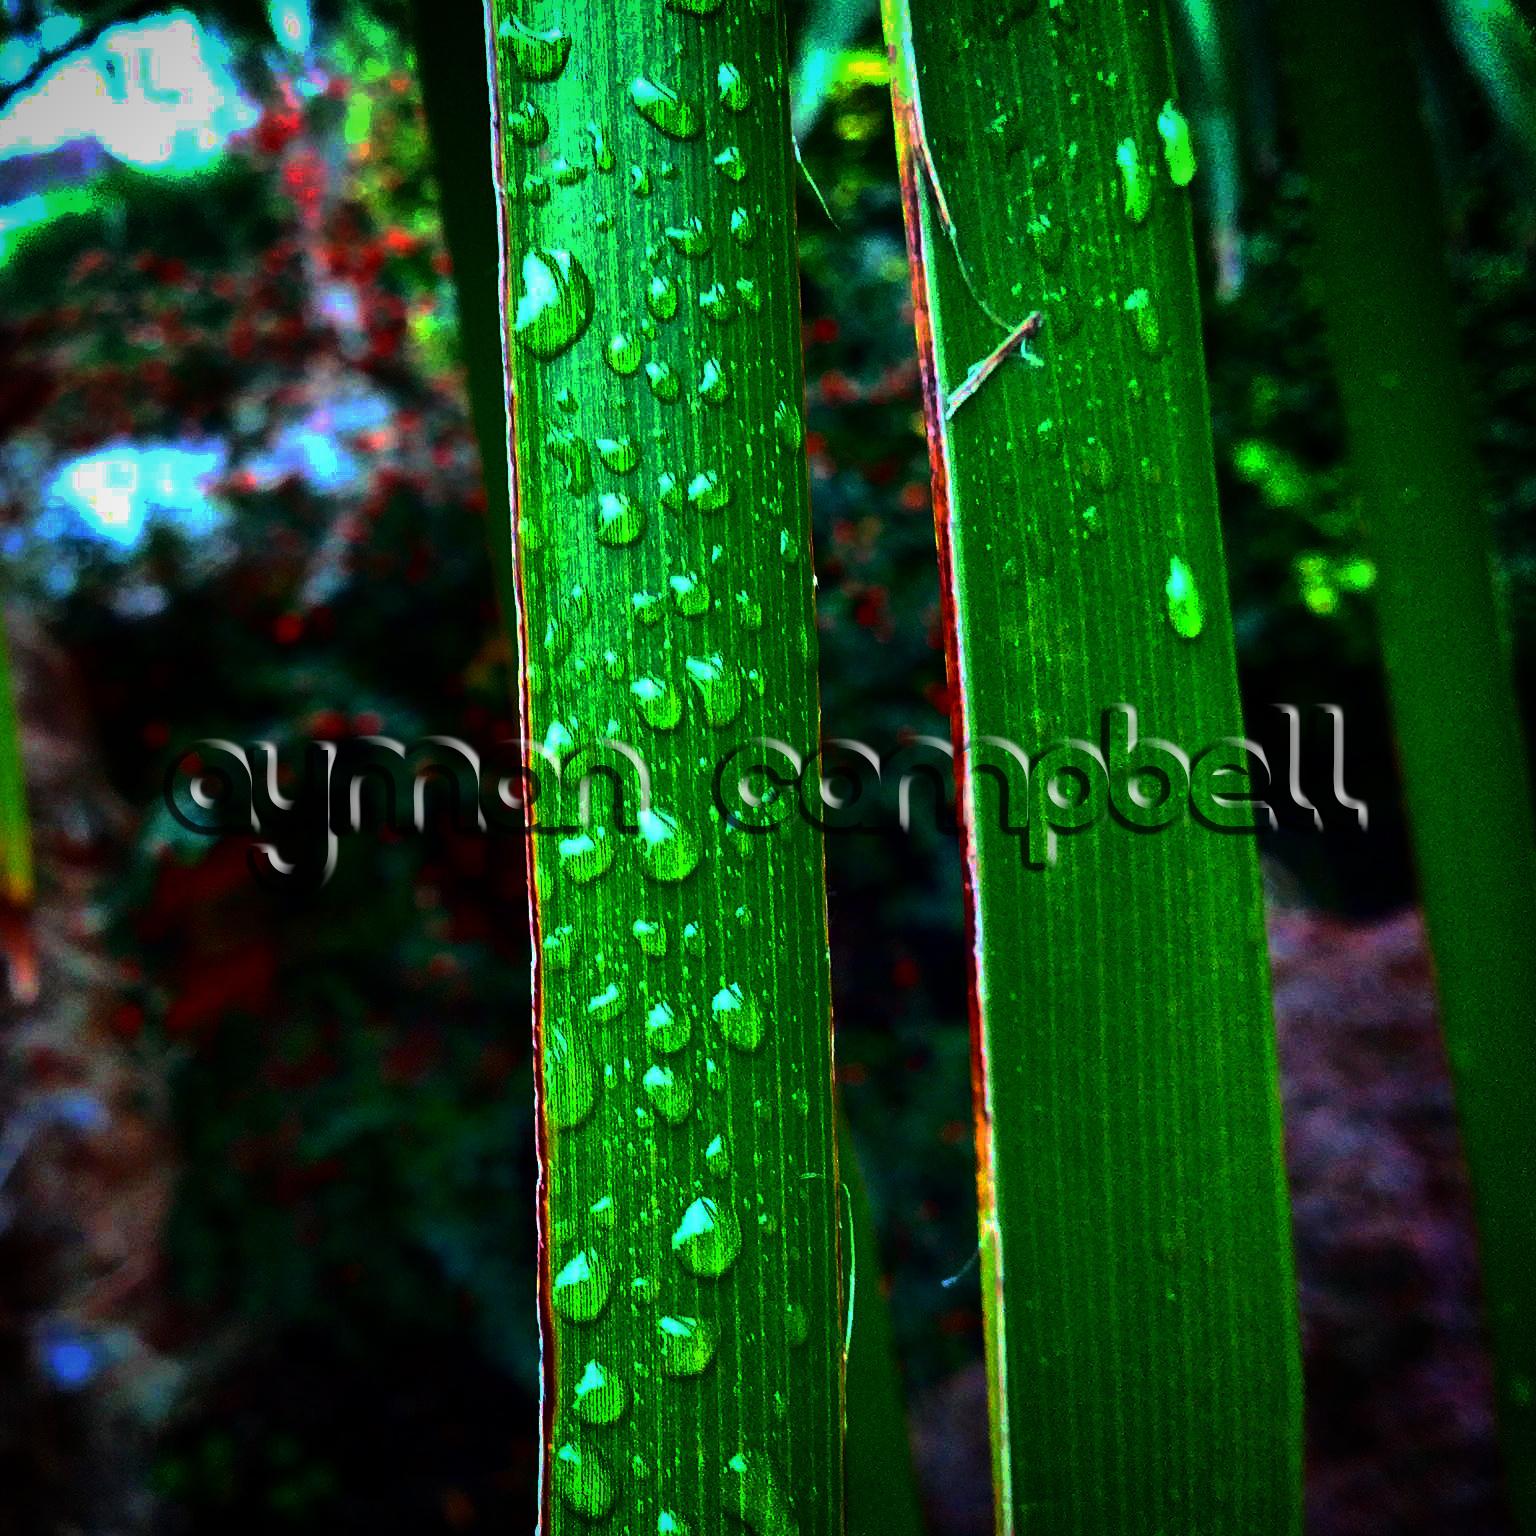 IMG_20140815_031001 (Watermarked)